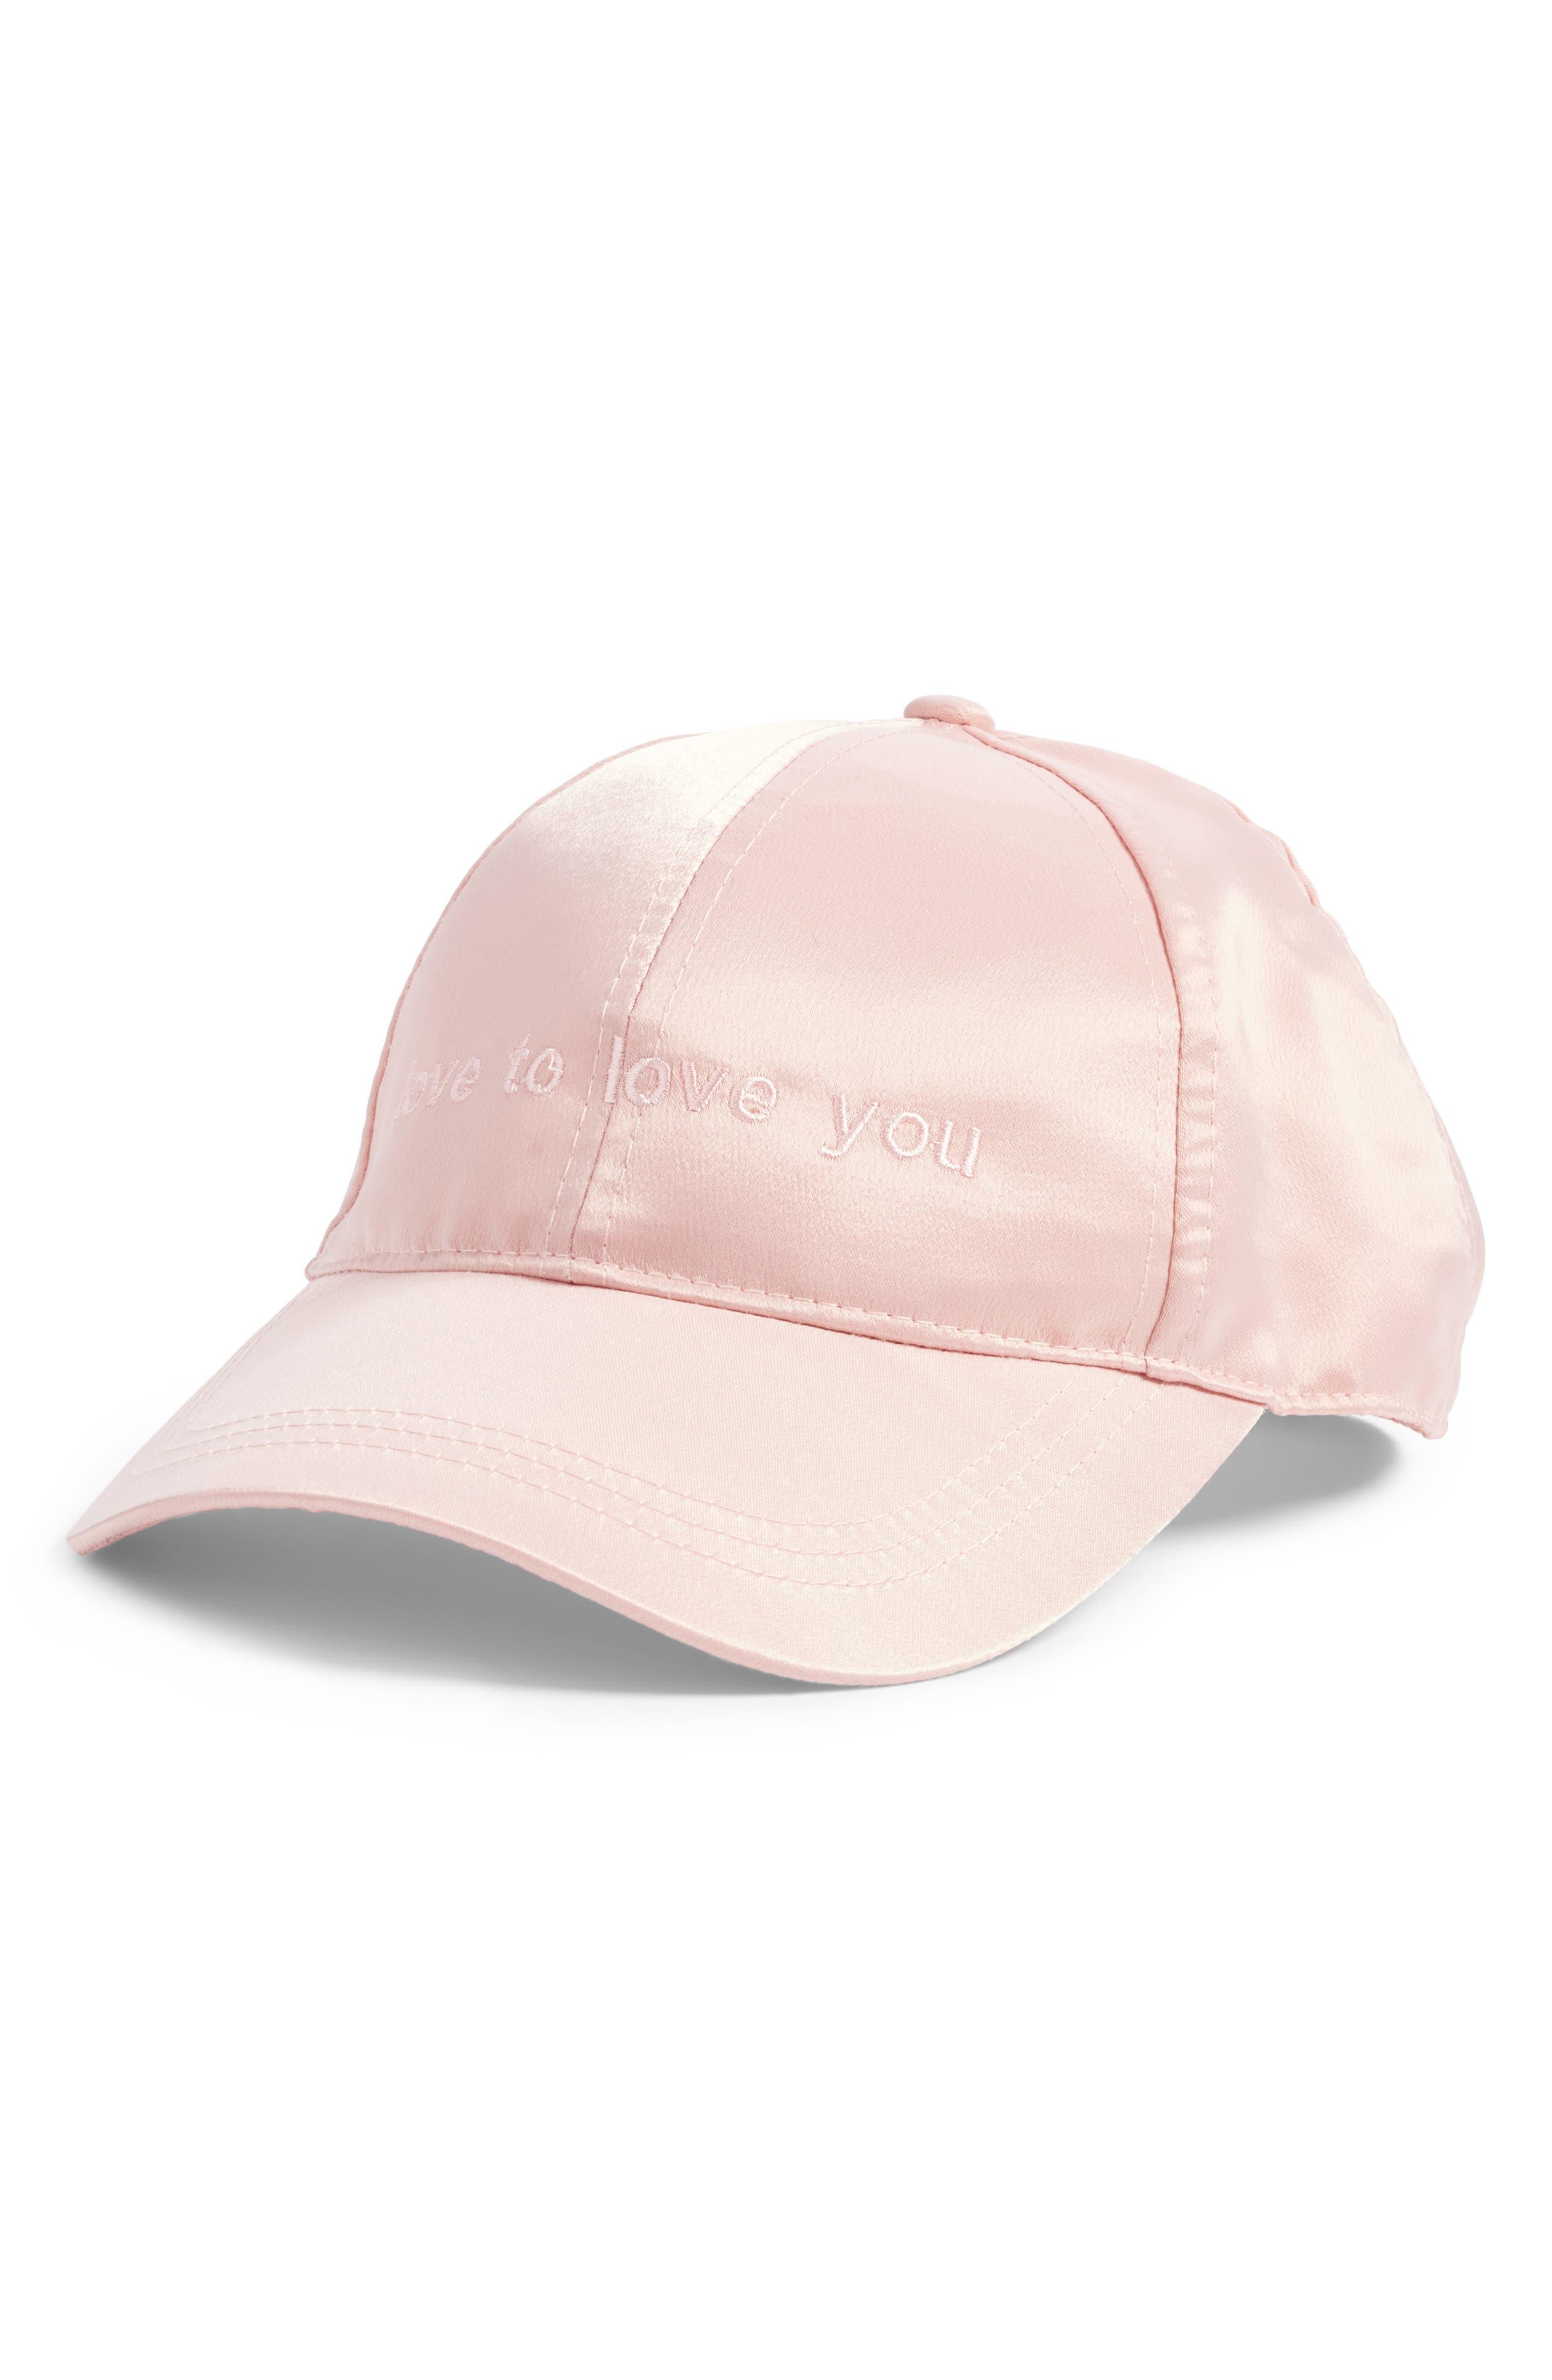 Embroidered Satin Baseball Cap,                         Main,                         color, Pink